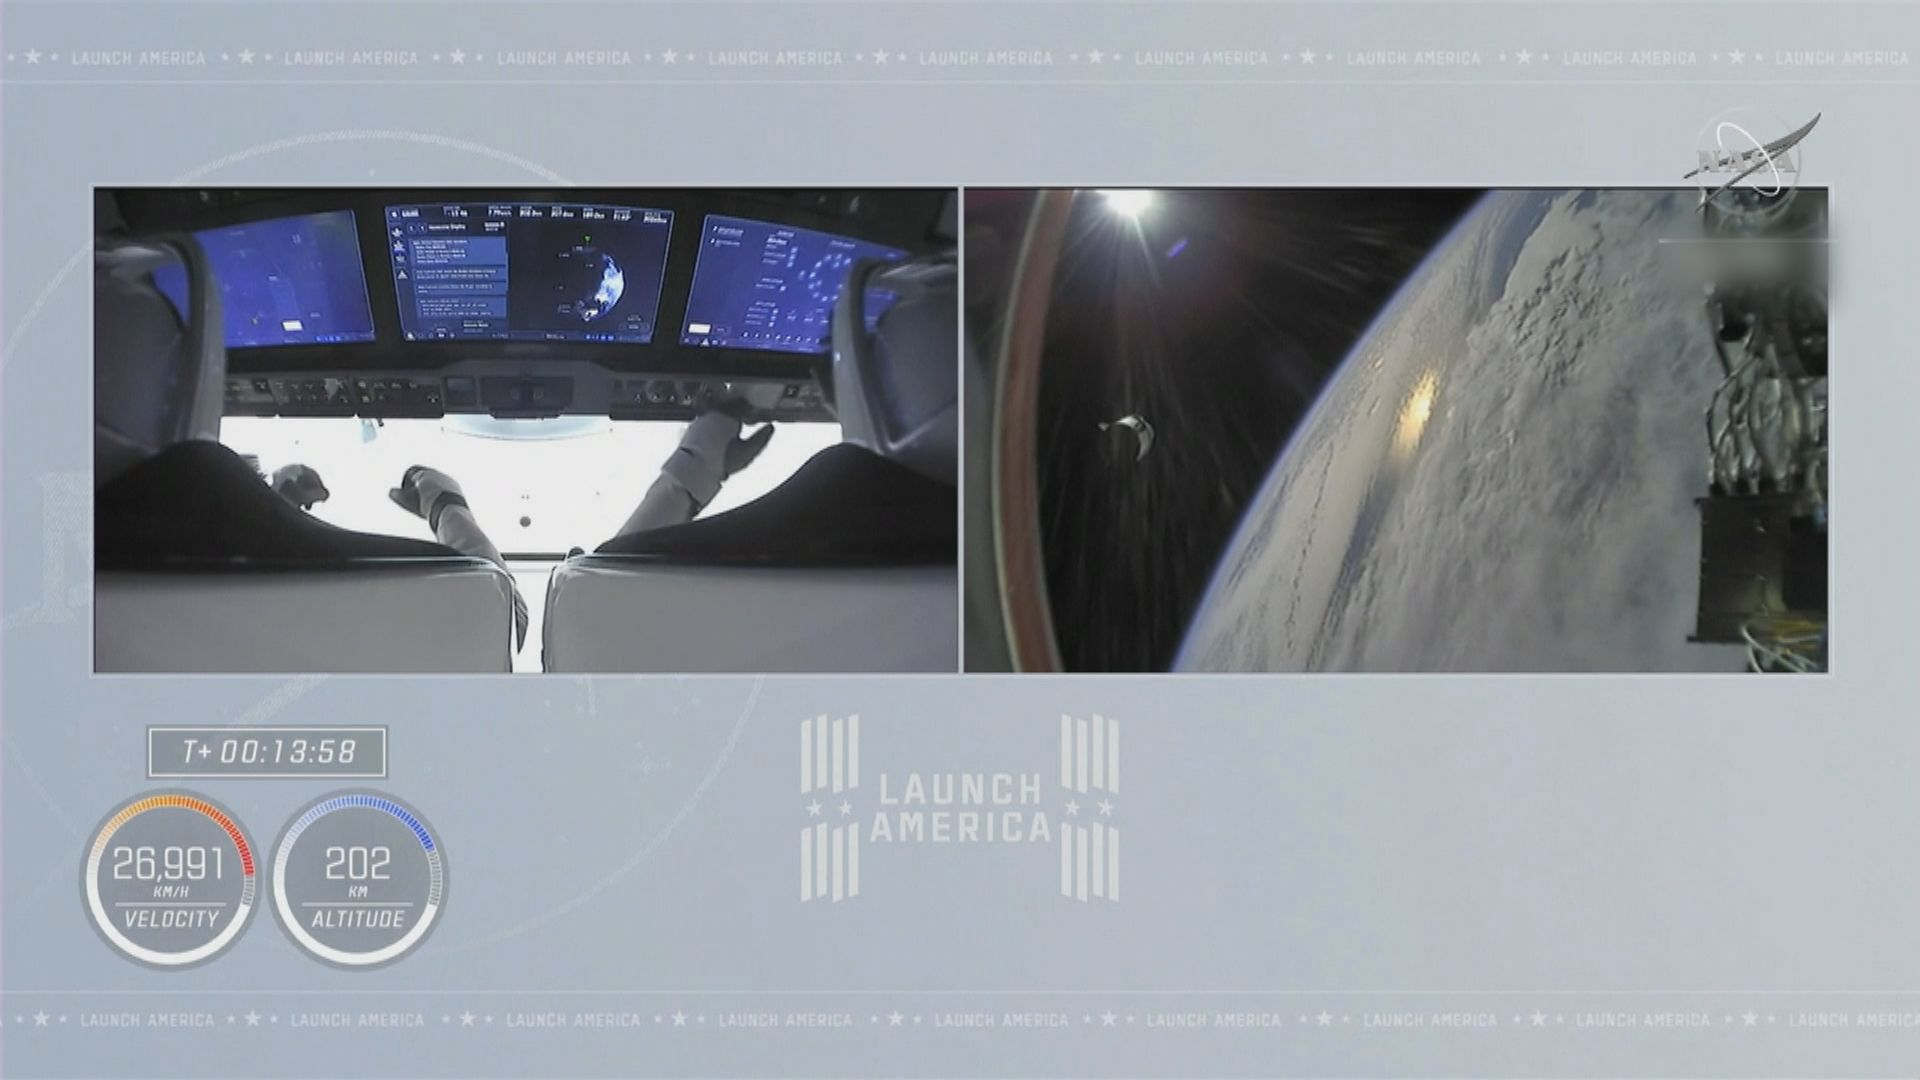 SpaceX首次利用回收火箭 成功送人上太空